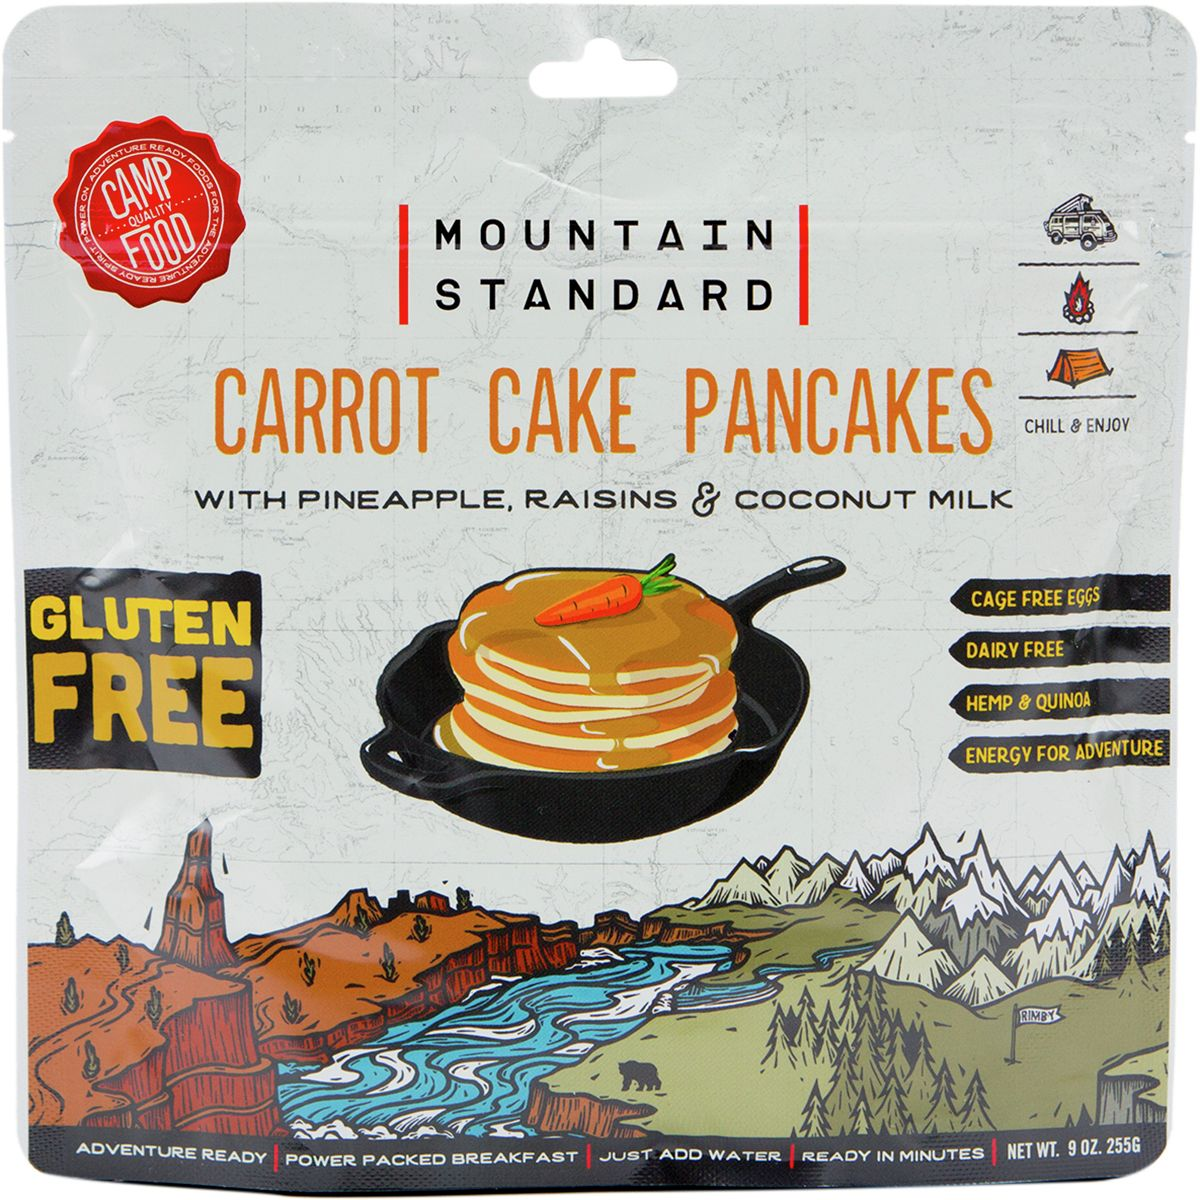 Backpacker's Pantry Mountain Standard Carrot Cake Pancakes